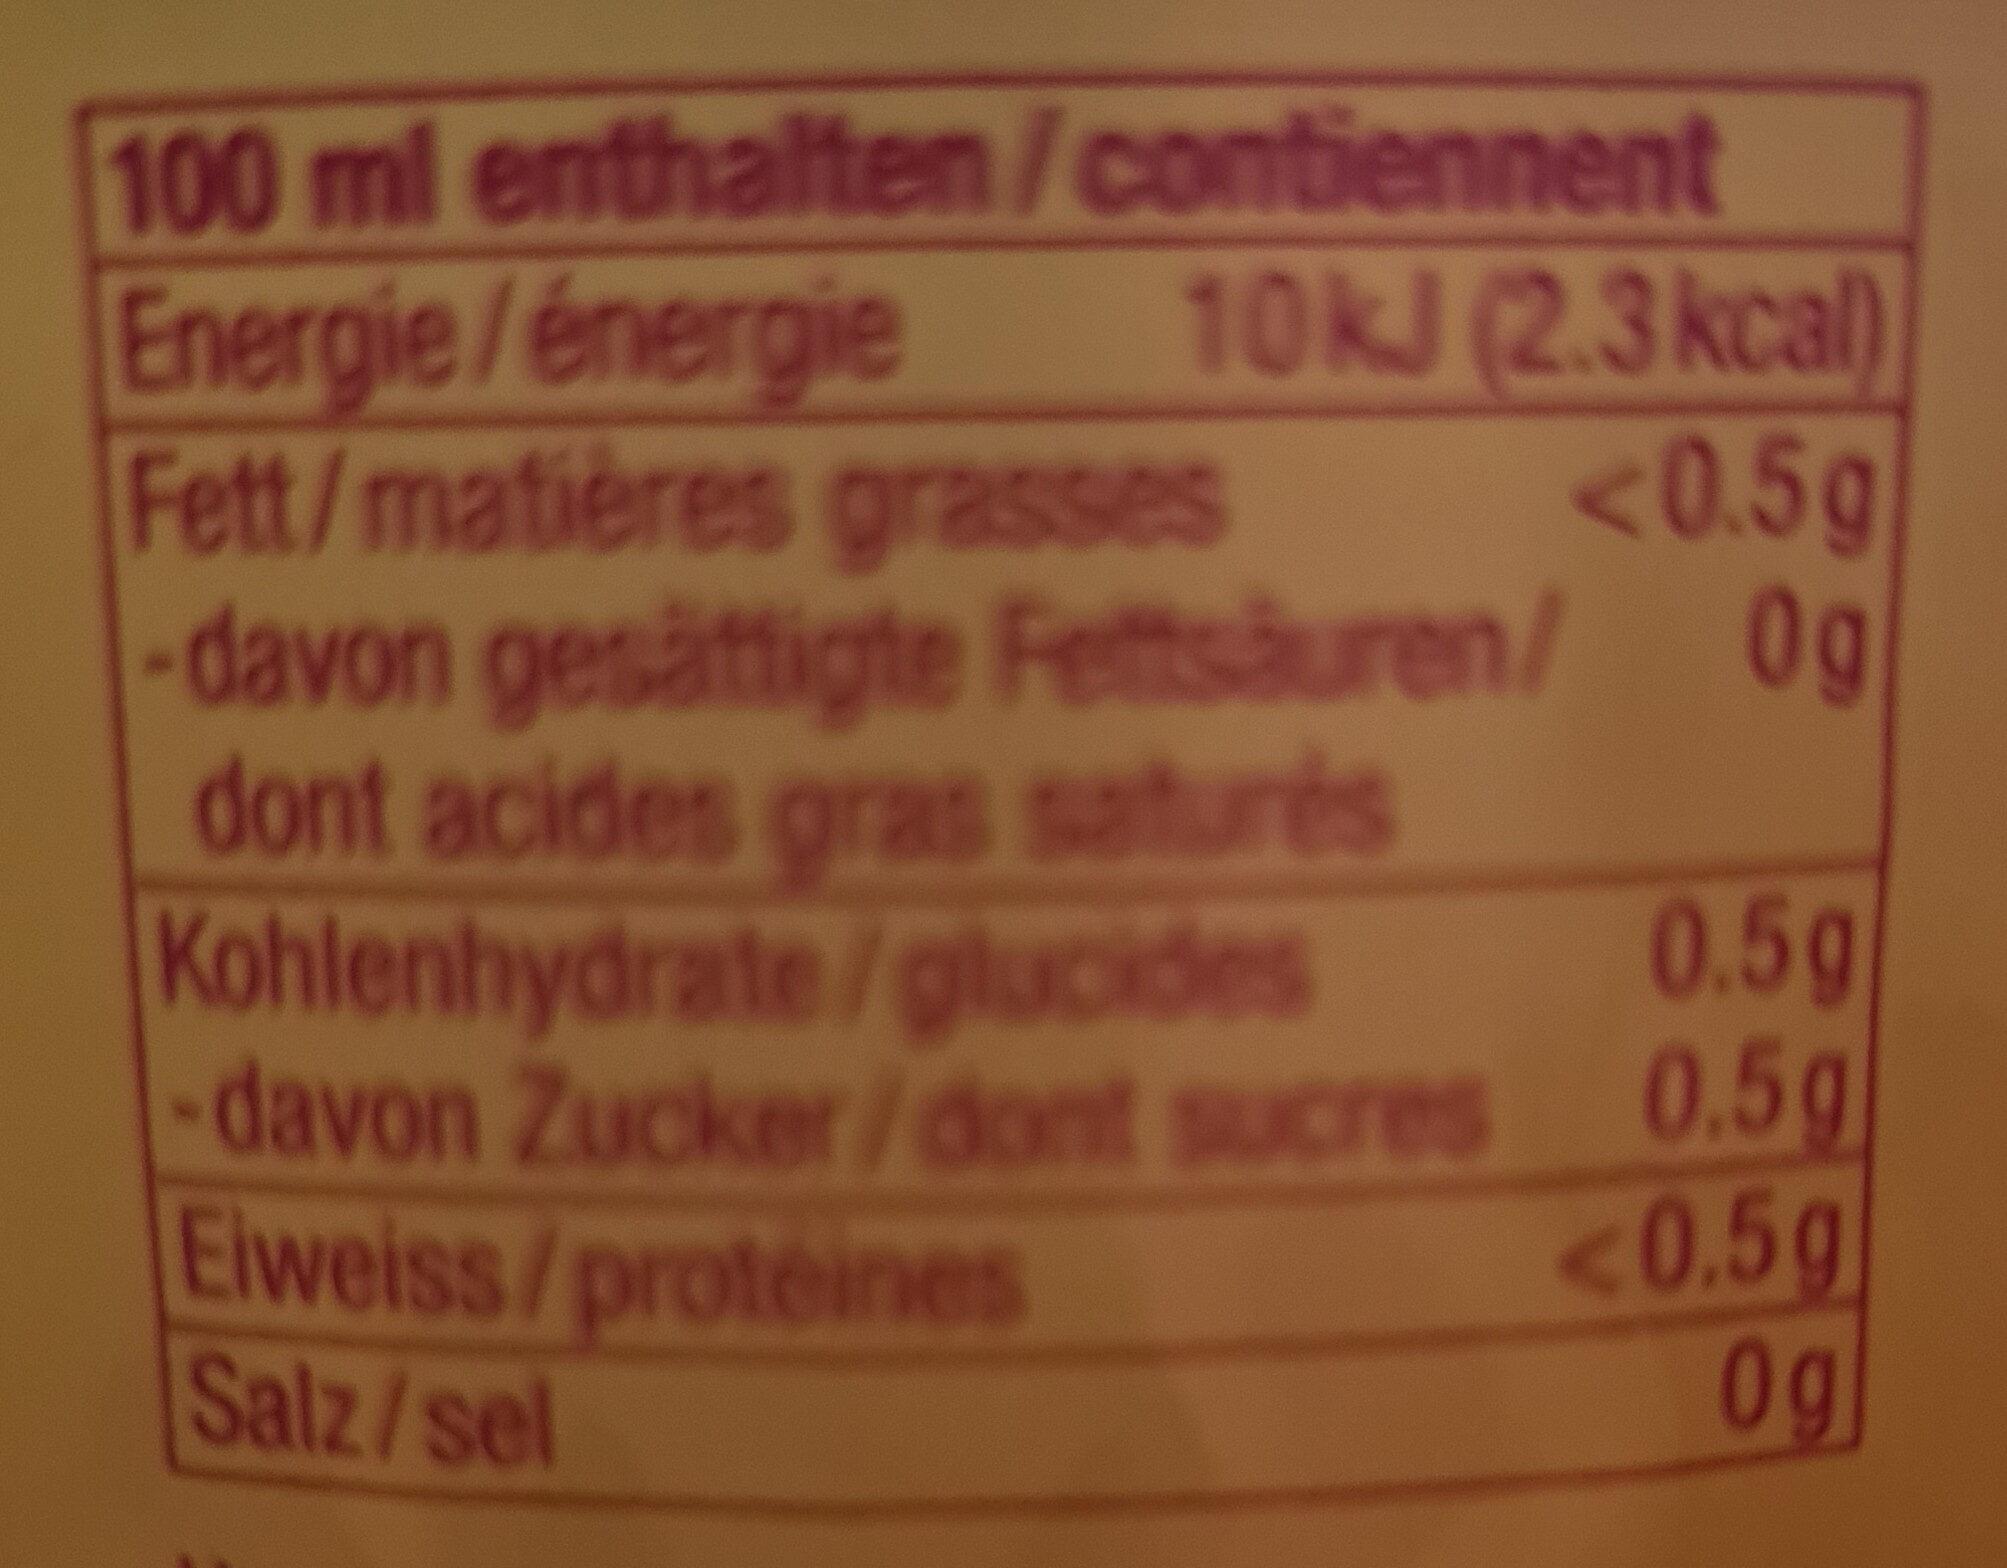 Sinalco Zero - Nutrition facts - fr